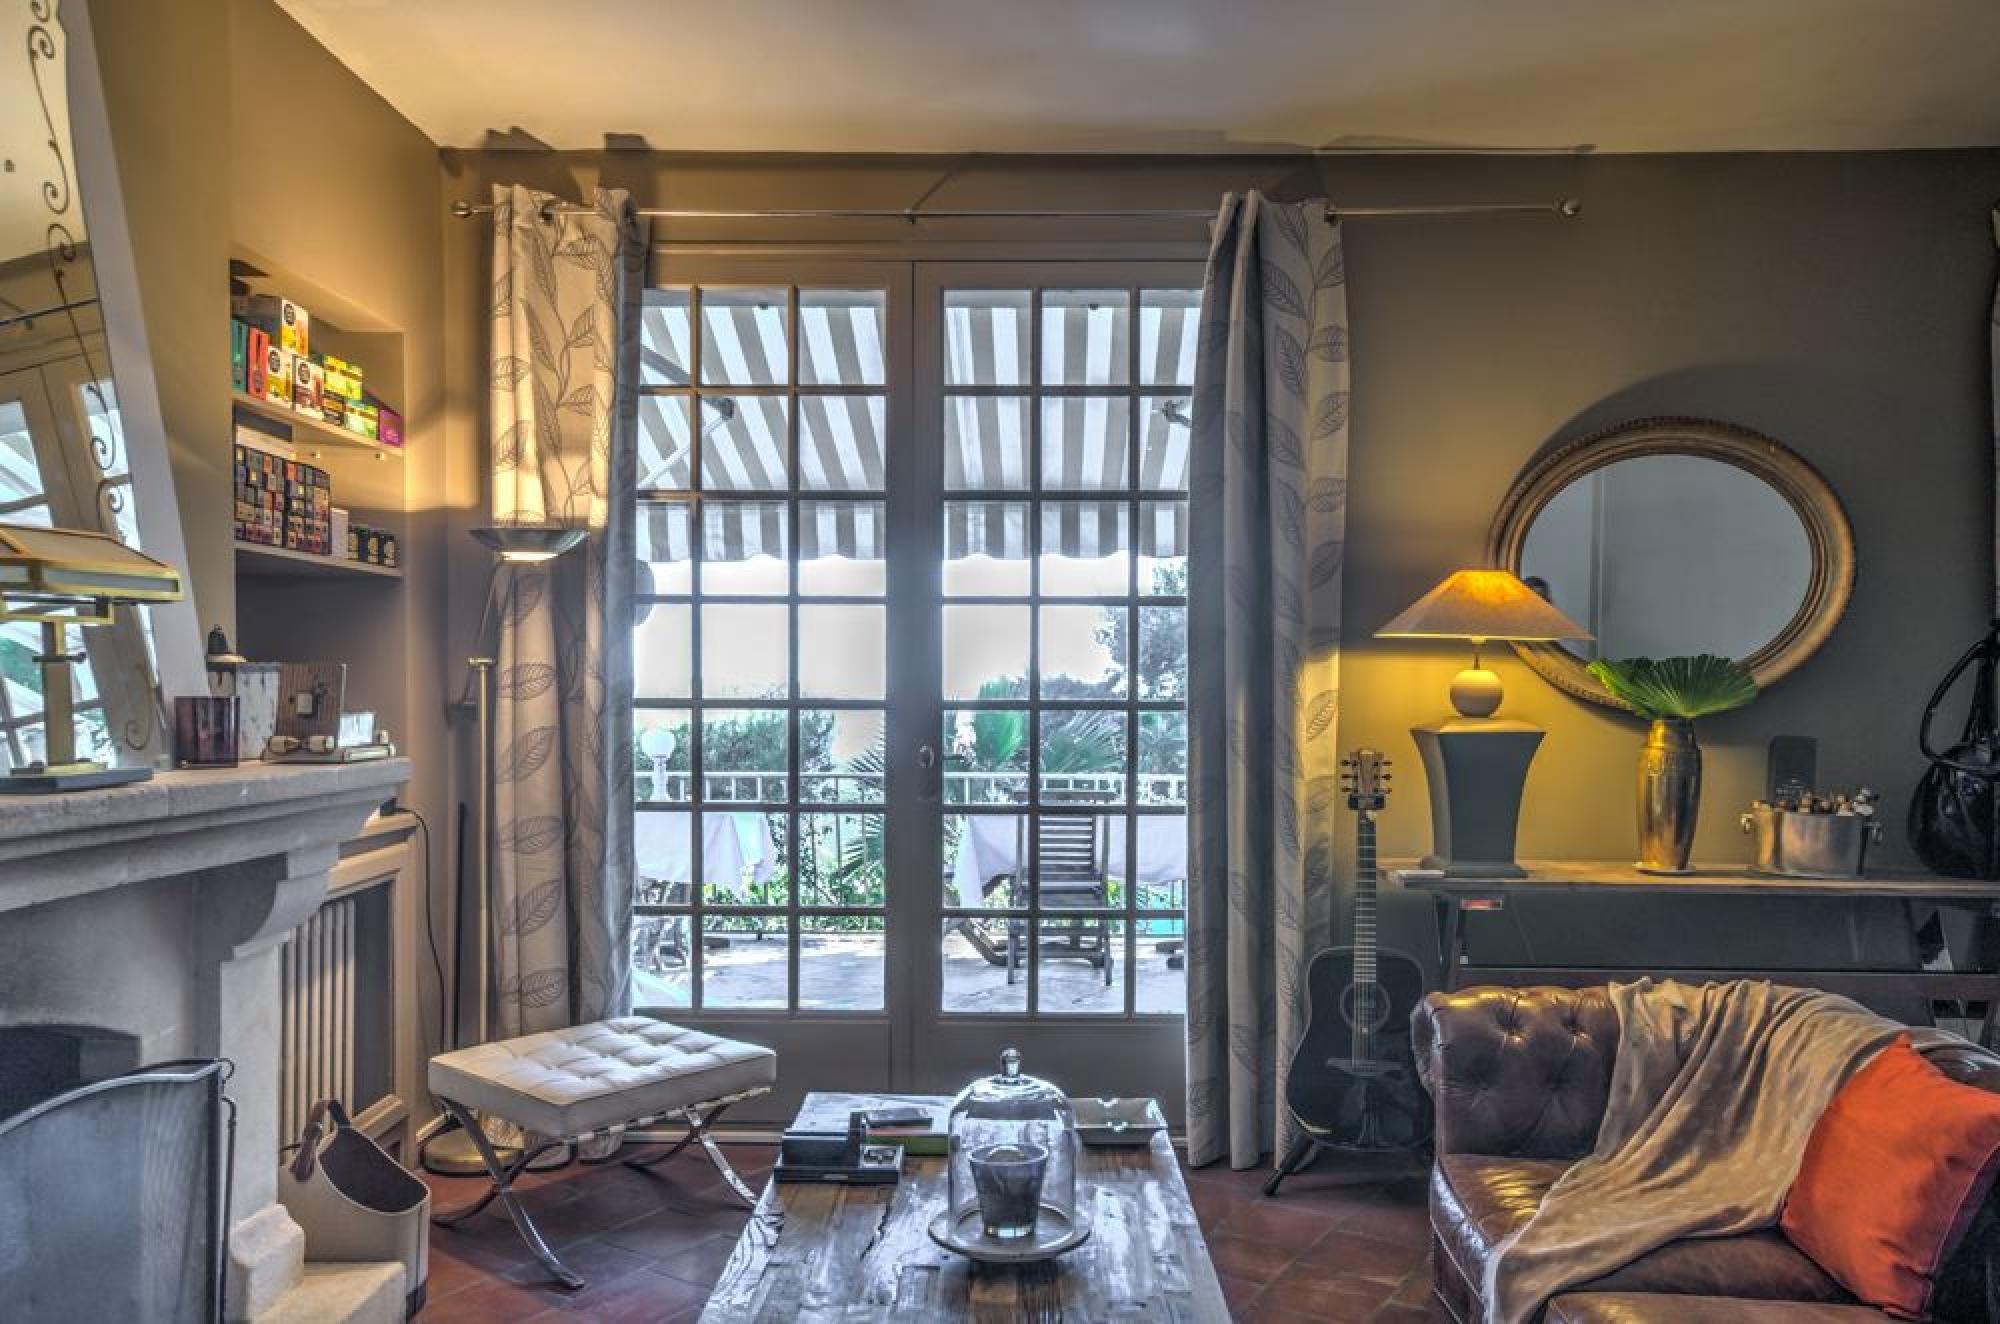 o dormir cassis les meilleures chambres d 39 h te cassis toota cassis. Black Bedroom Furniture Sets. Home Design Ideas